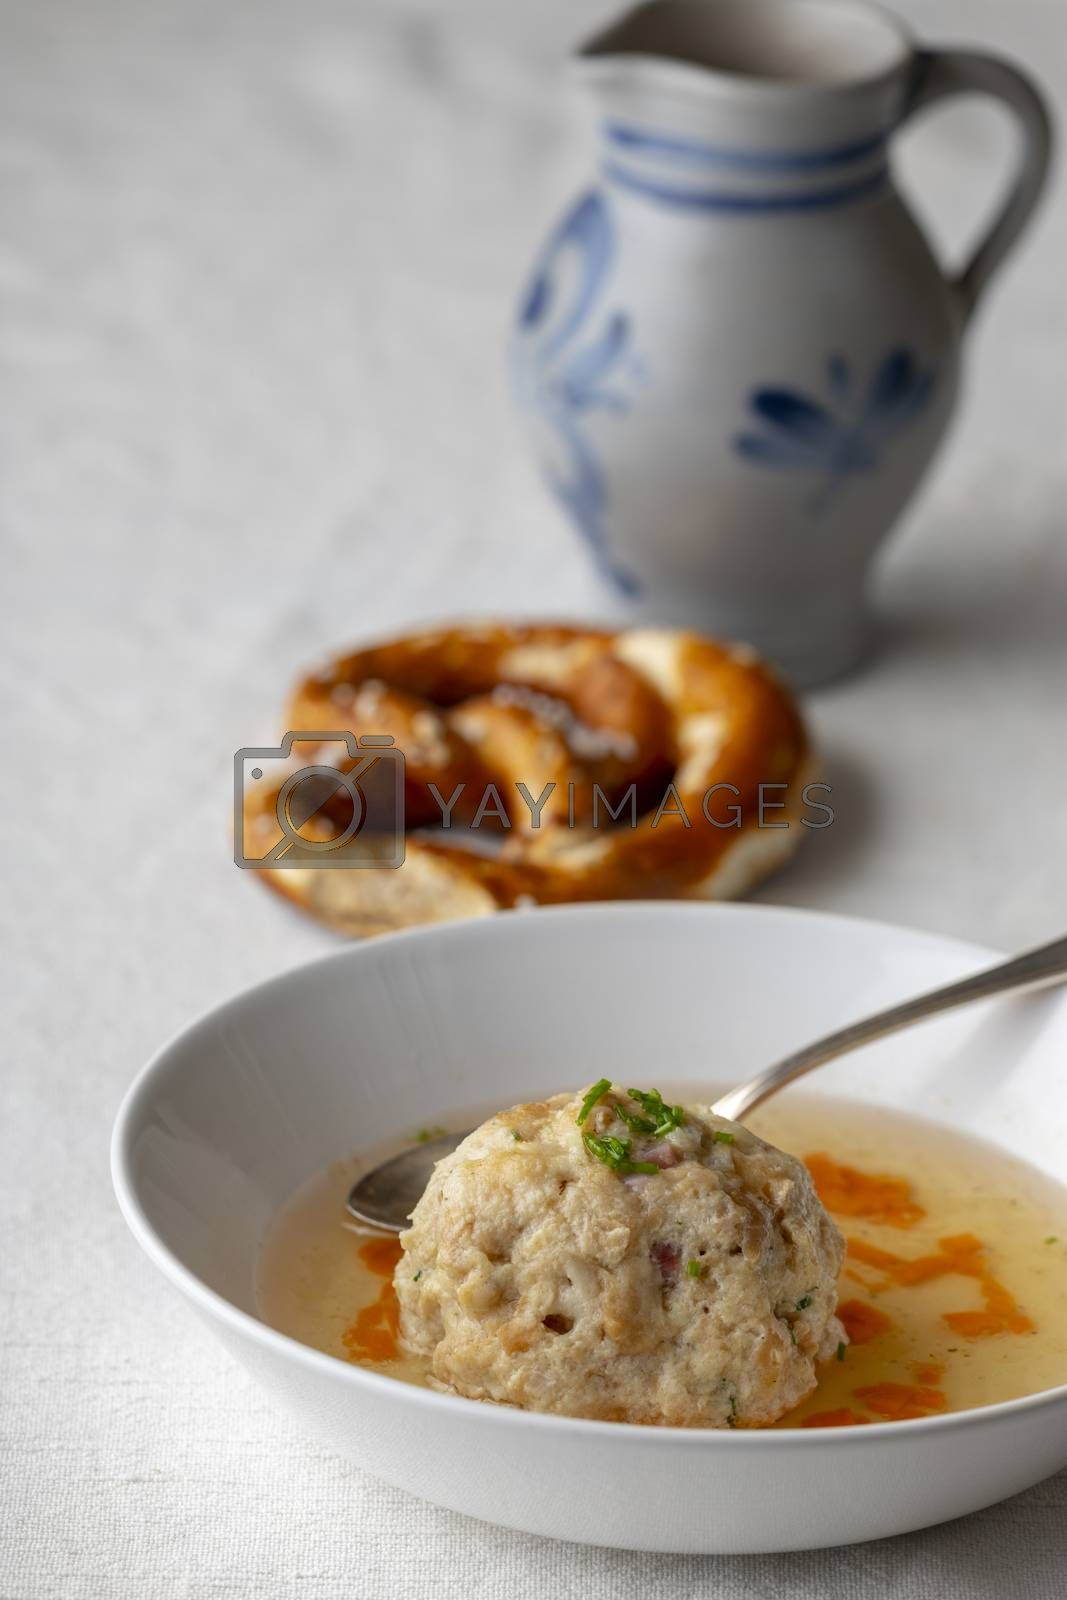 bavarian bacon dumpling in a broth